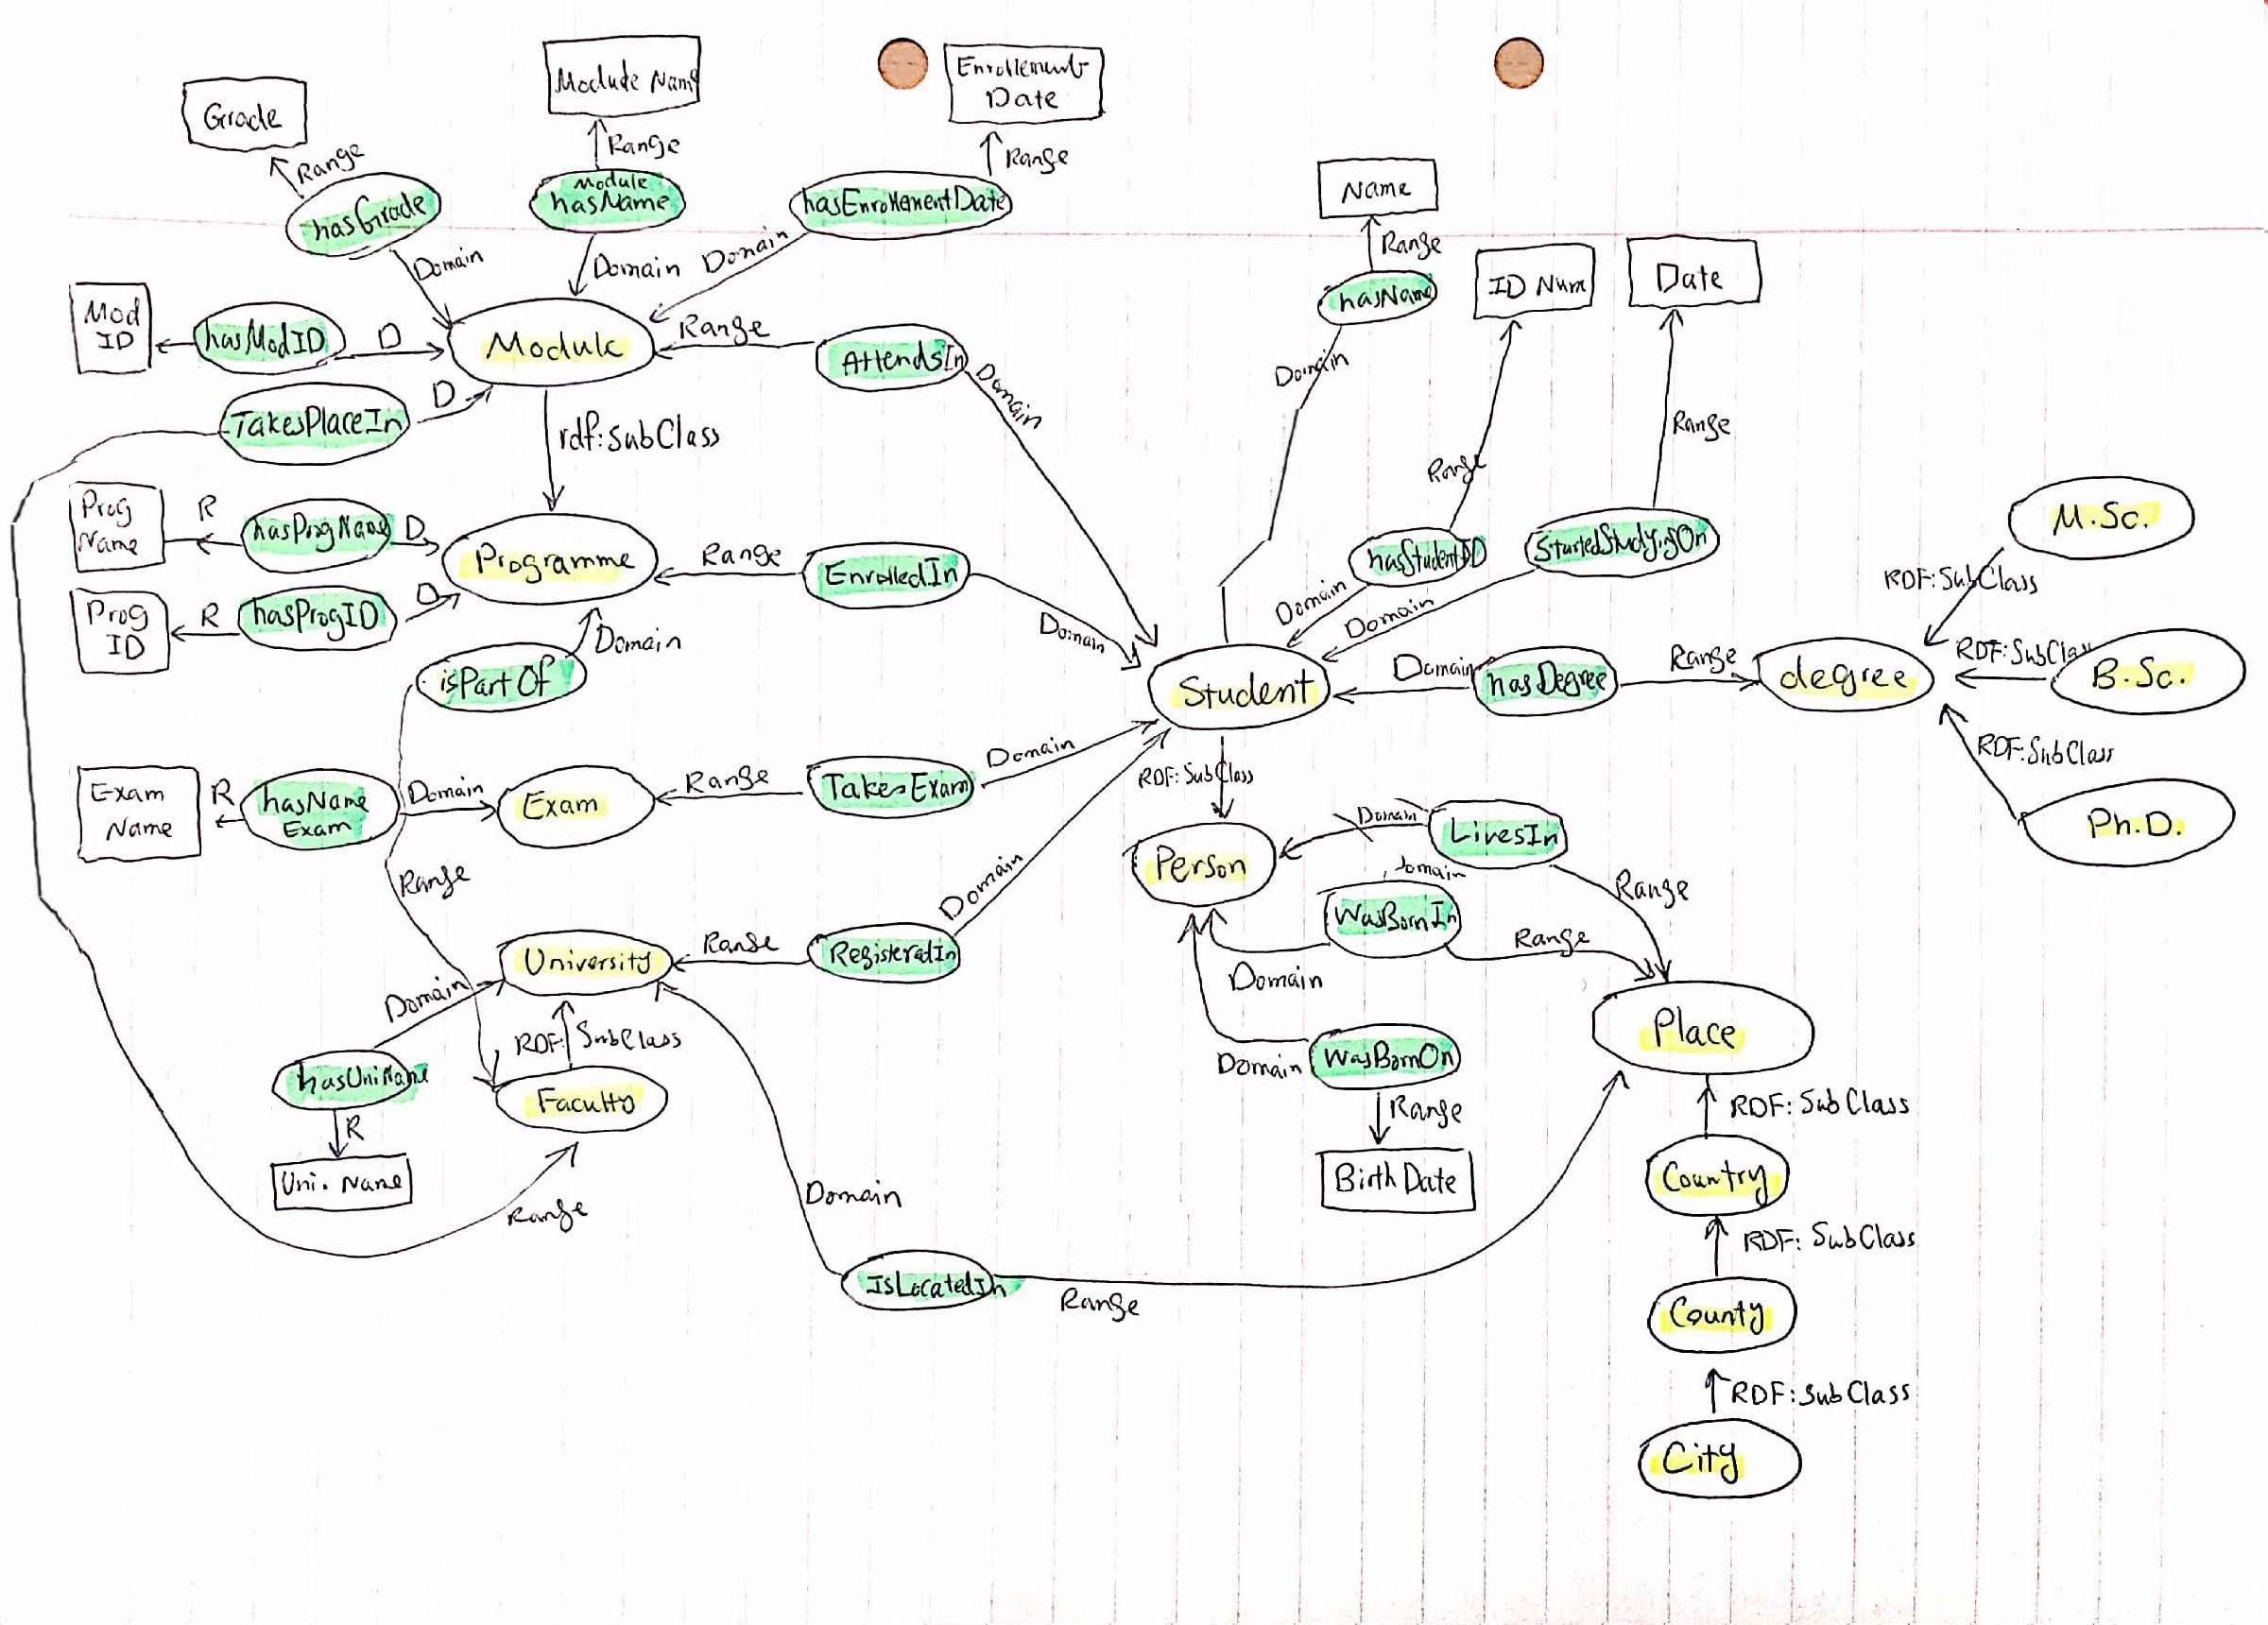 Student management system data model schema